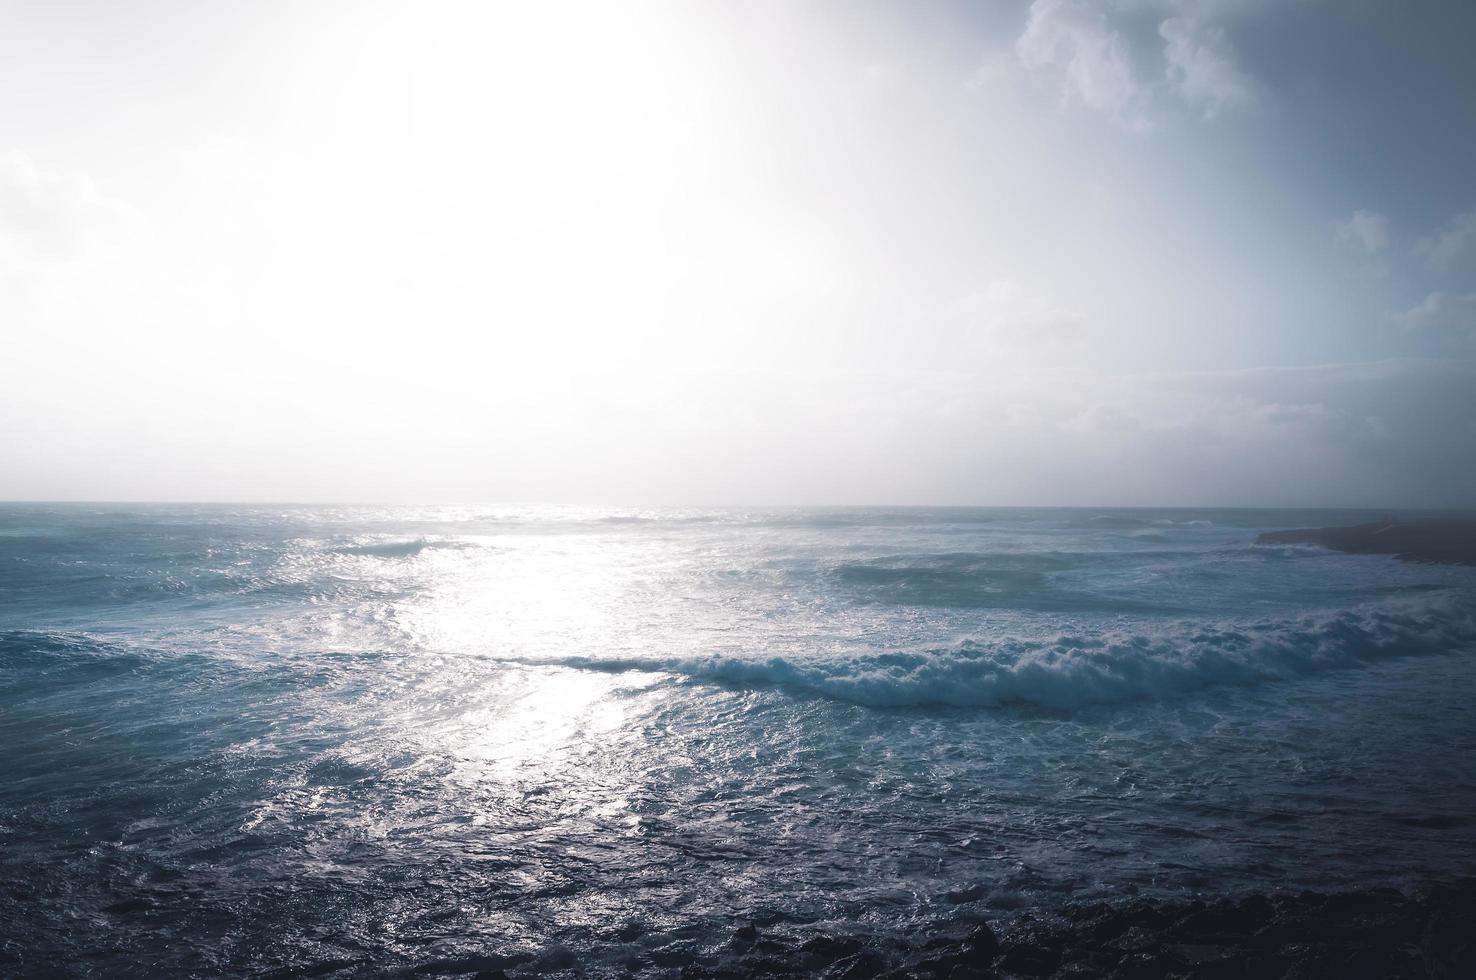 paysage marin méditerranéen minimaliste photo